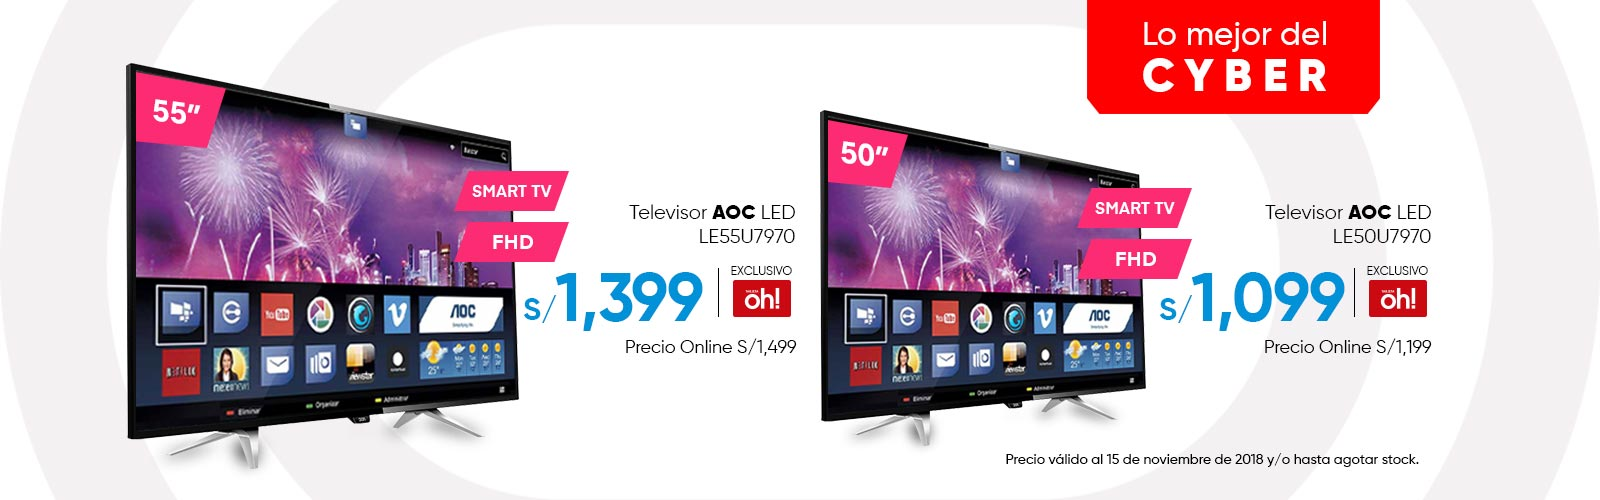 Televisores AOC